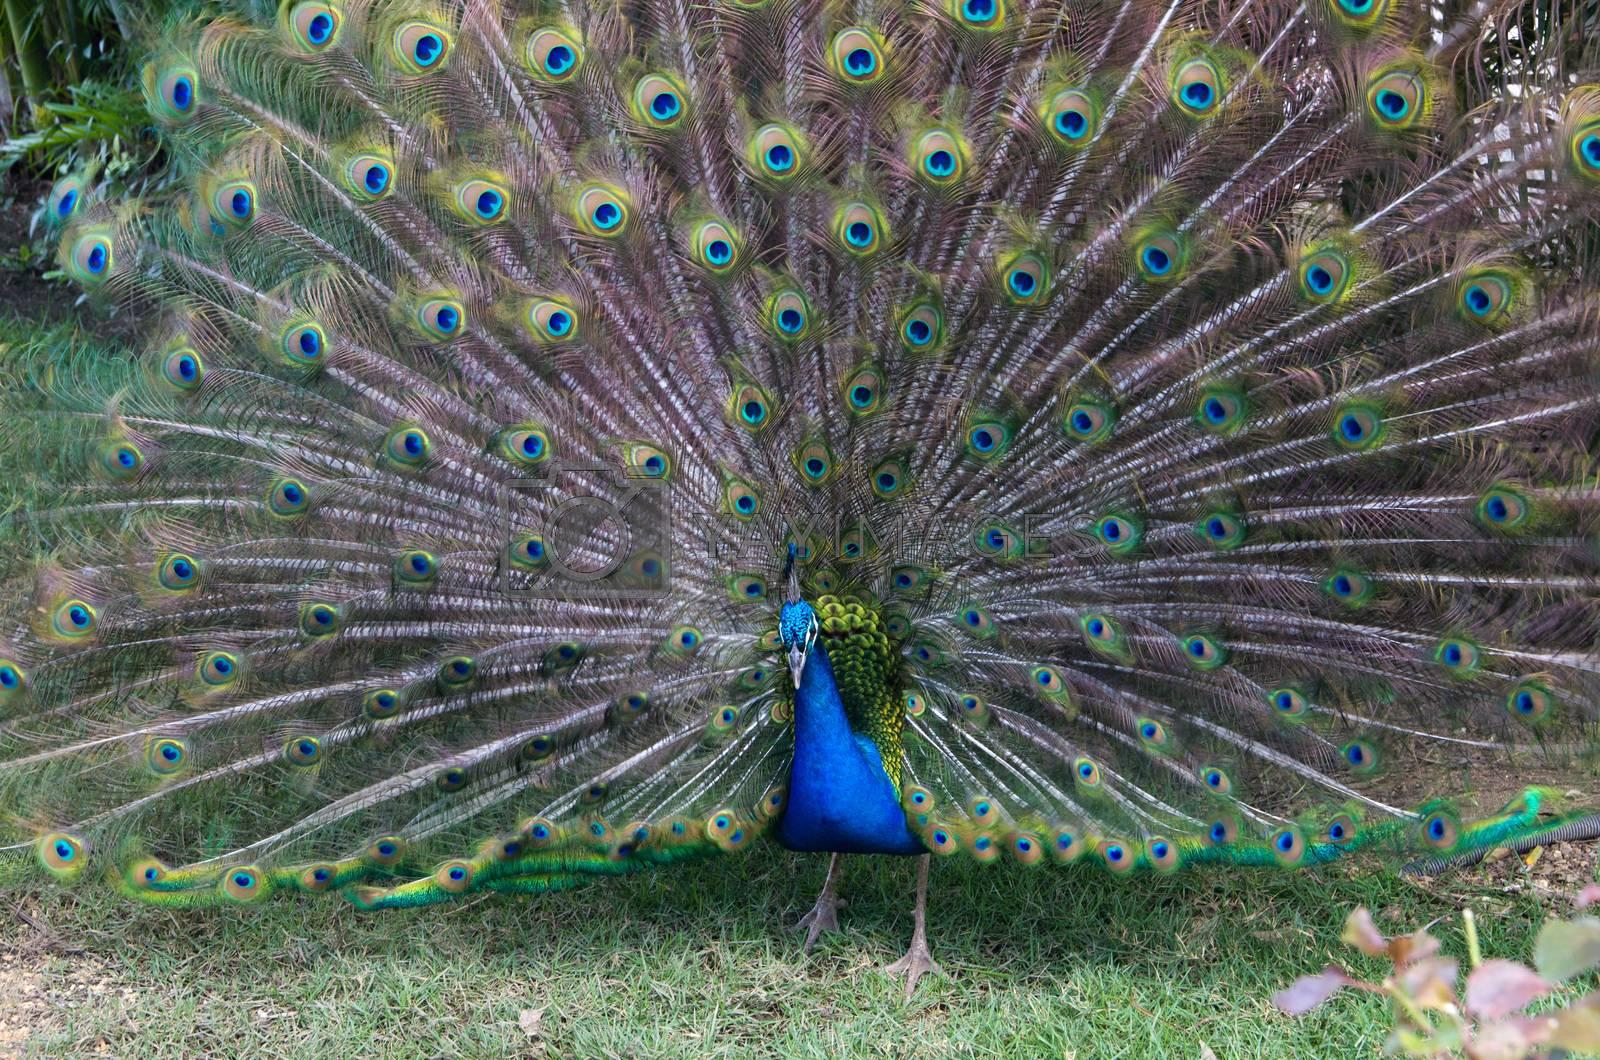 Peacock on a green grass